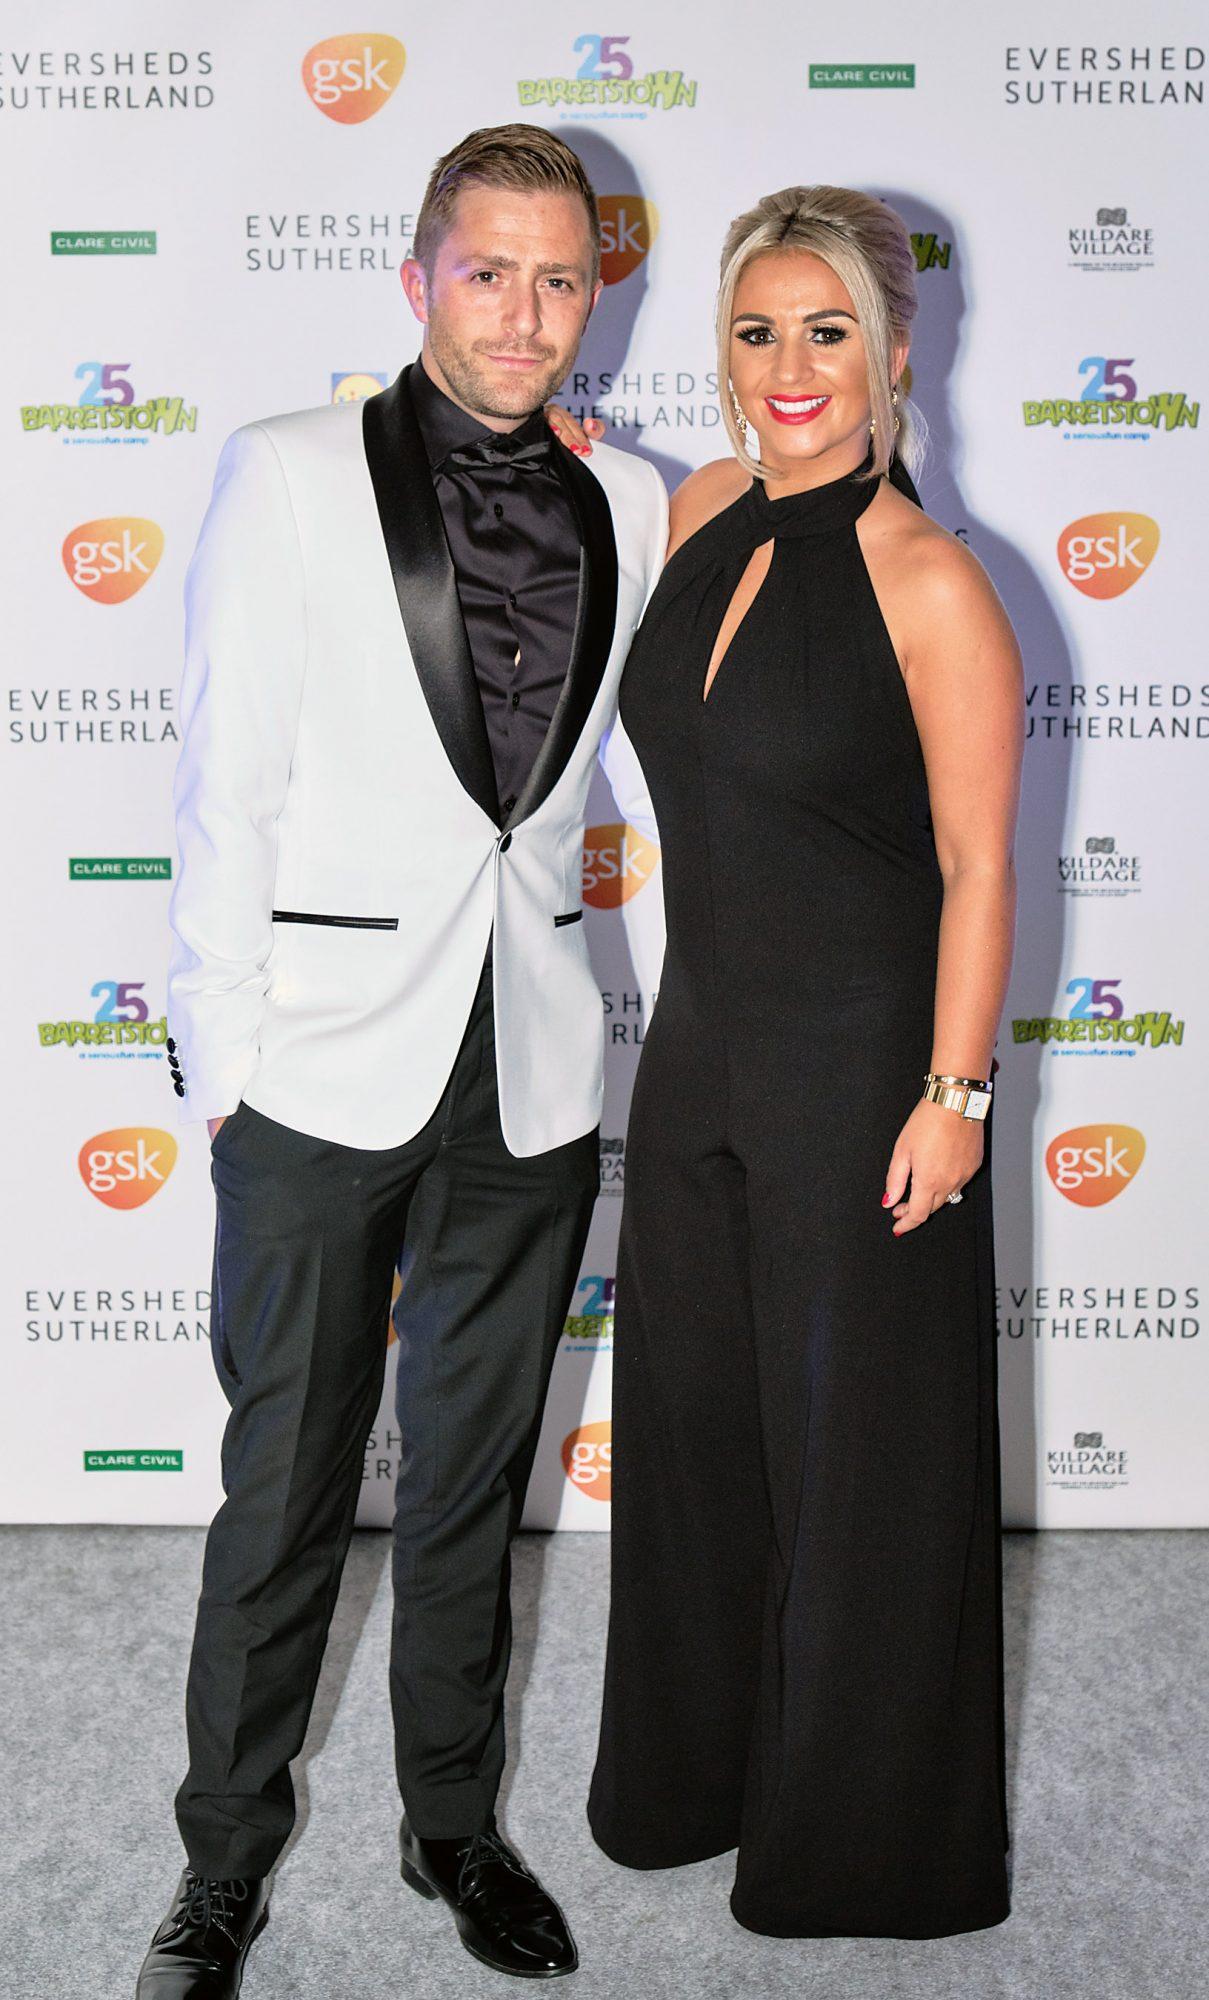 George McMahon and wife Rachel at the Barretstown 25th Anniversary Gala Ball at the RDS, Ballsbridge, Dublin.  Pictures: Cathal Mac an Bheatha